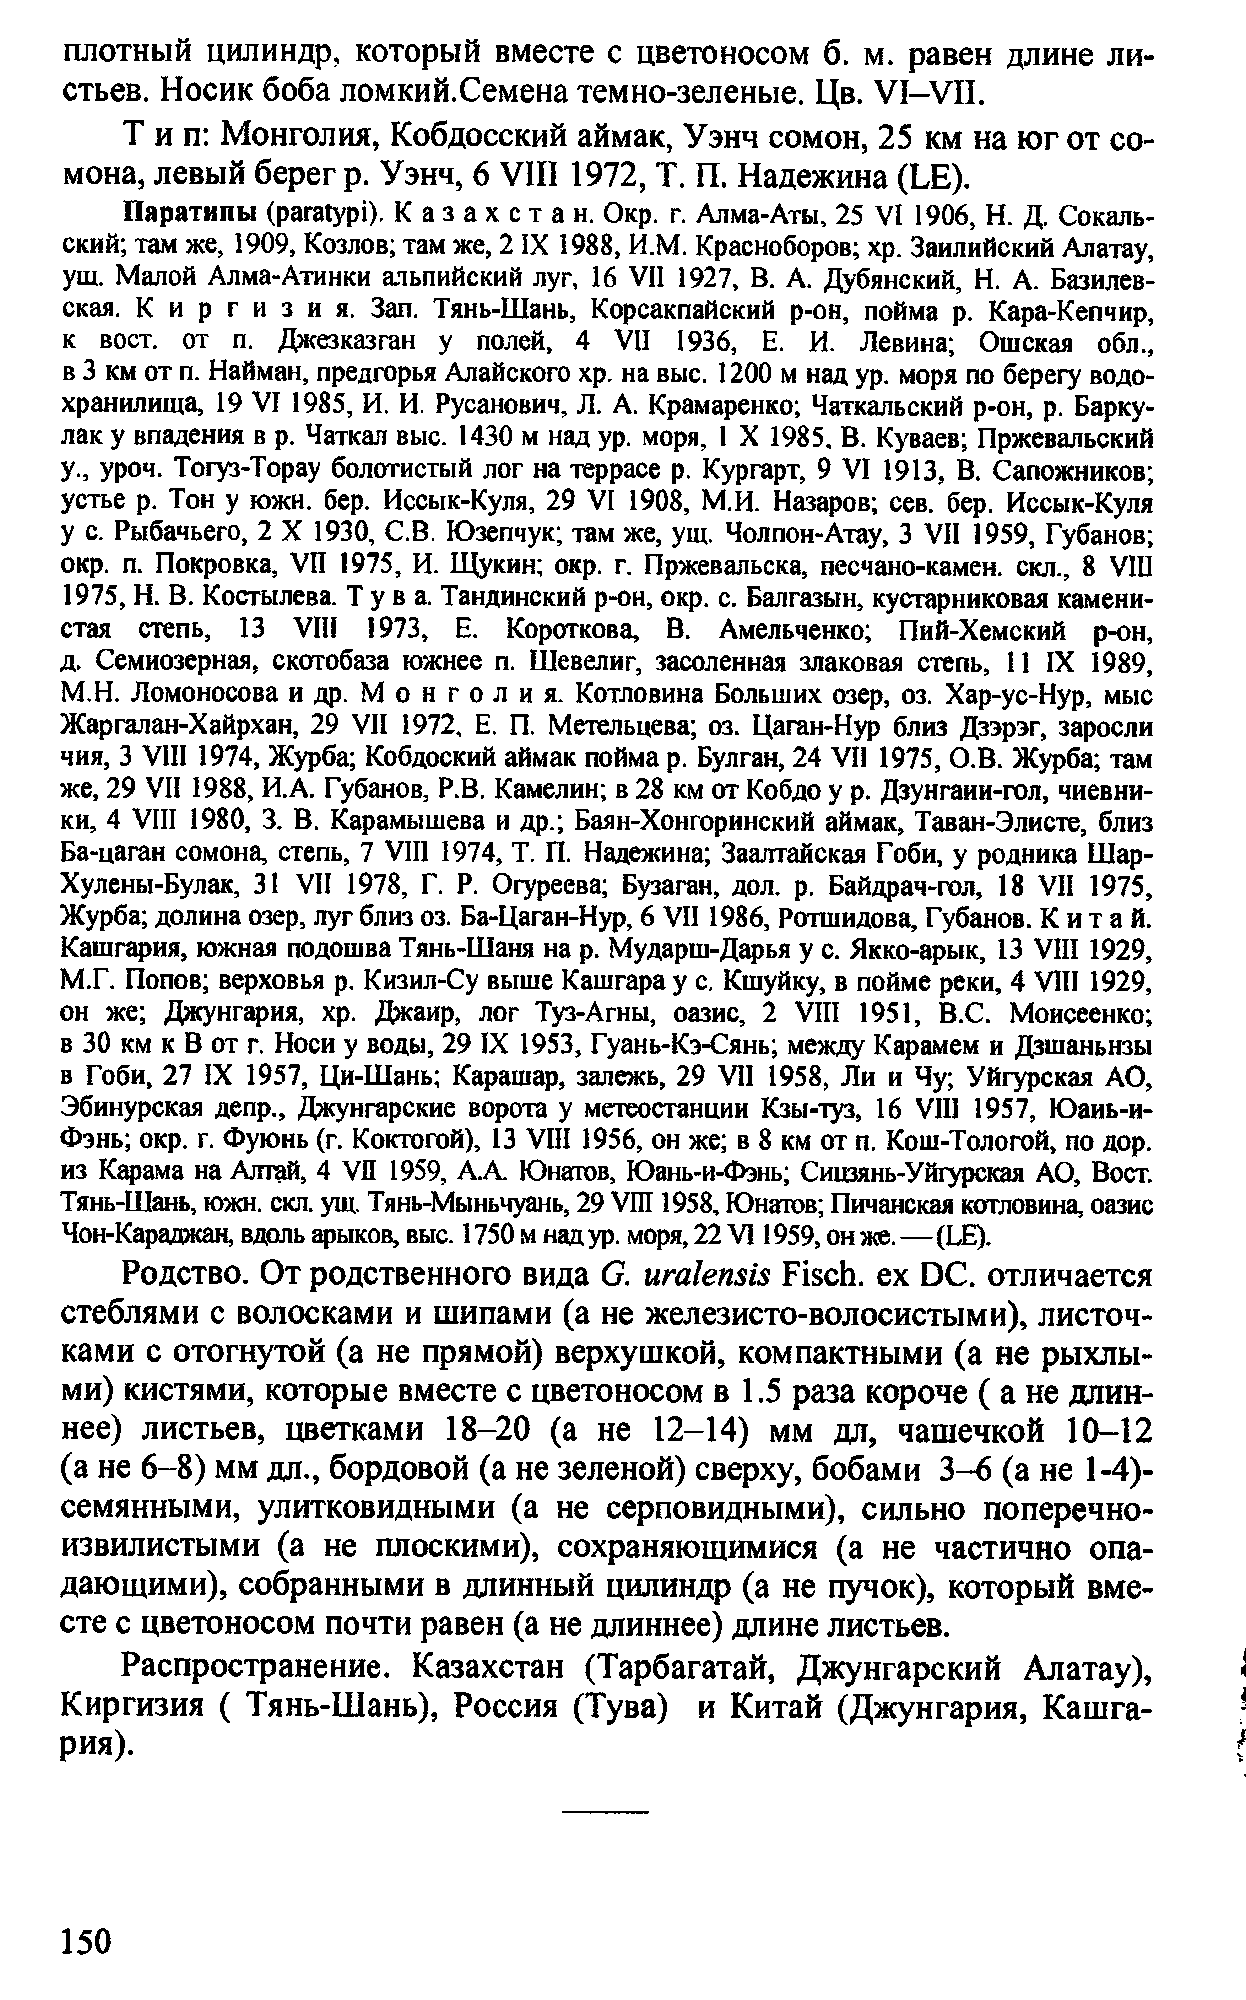 https://forum.plantarium.ru/misc.php?action=pun_attachment&item=26221&download=0